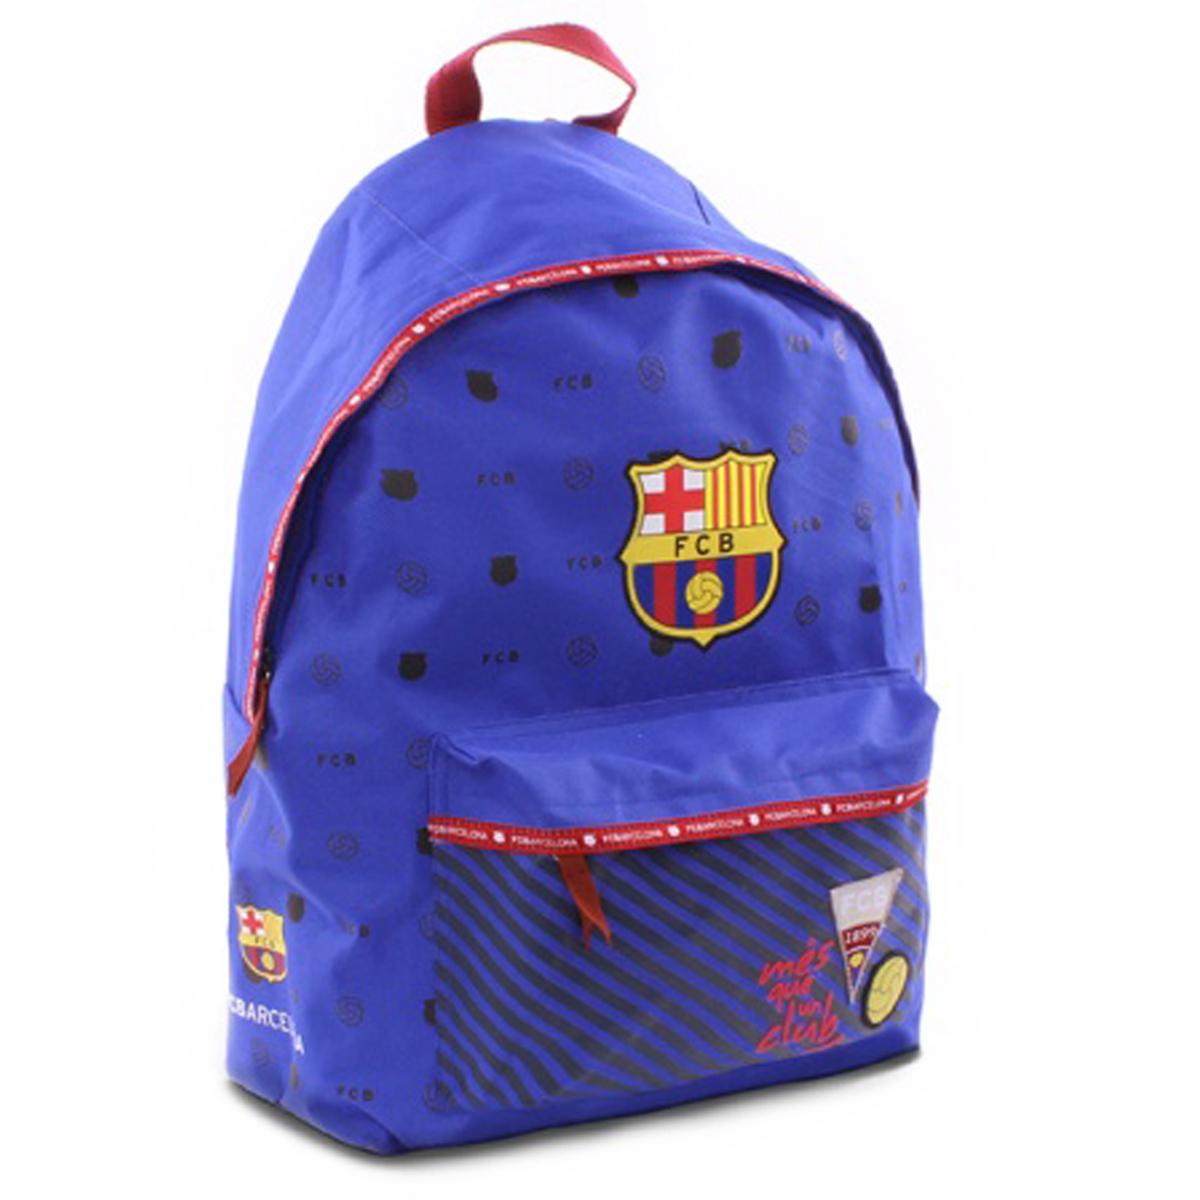 Sac à dos \'FC Barcelona\' bleu rouge - 40x30x14 cm - [Q7431]